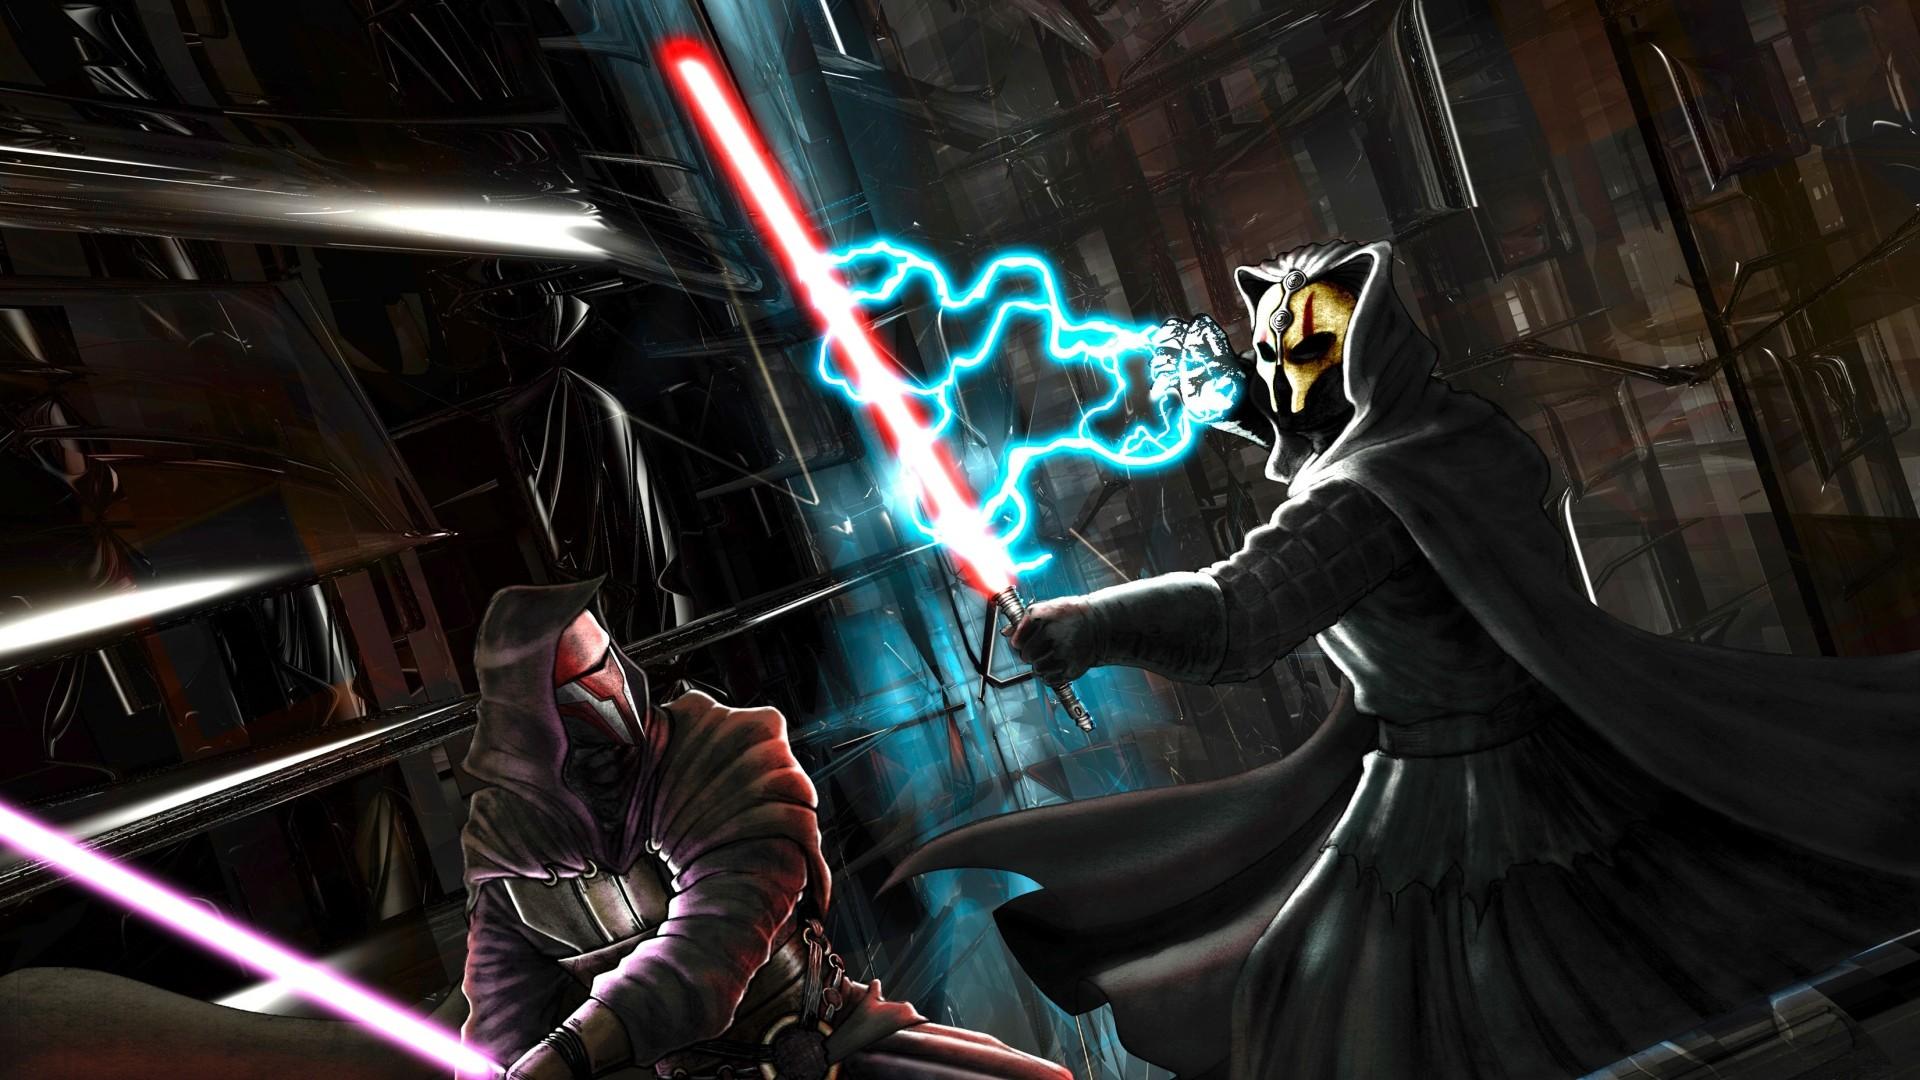 Wallpaper star wars, knights of the old republic, darth revan,  darth nihilus